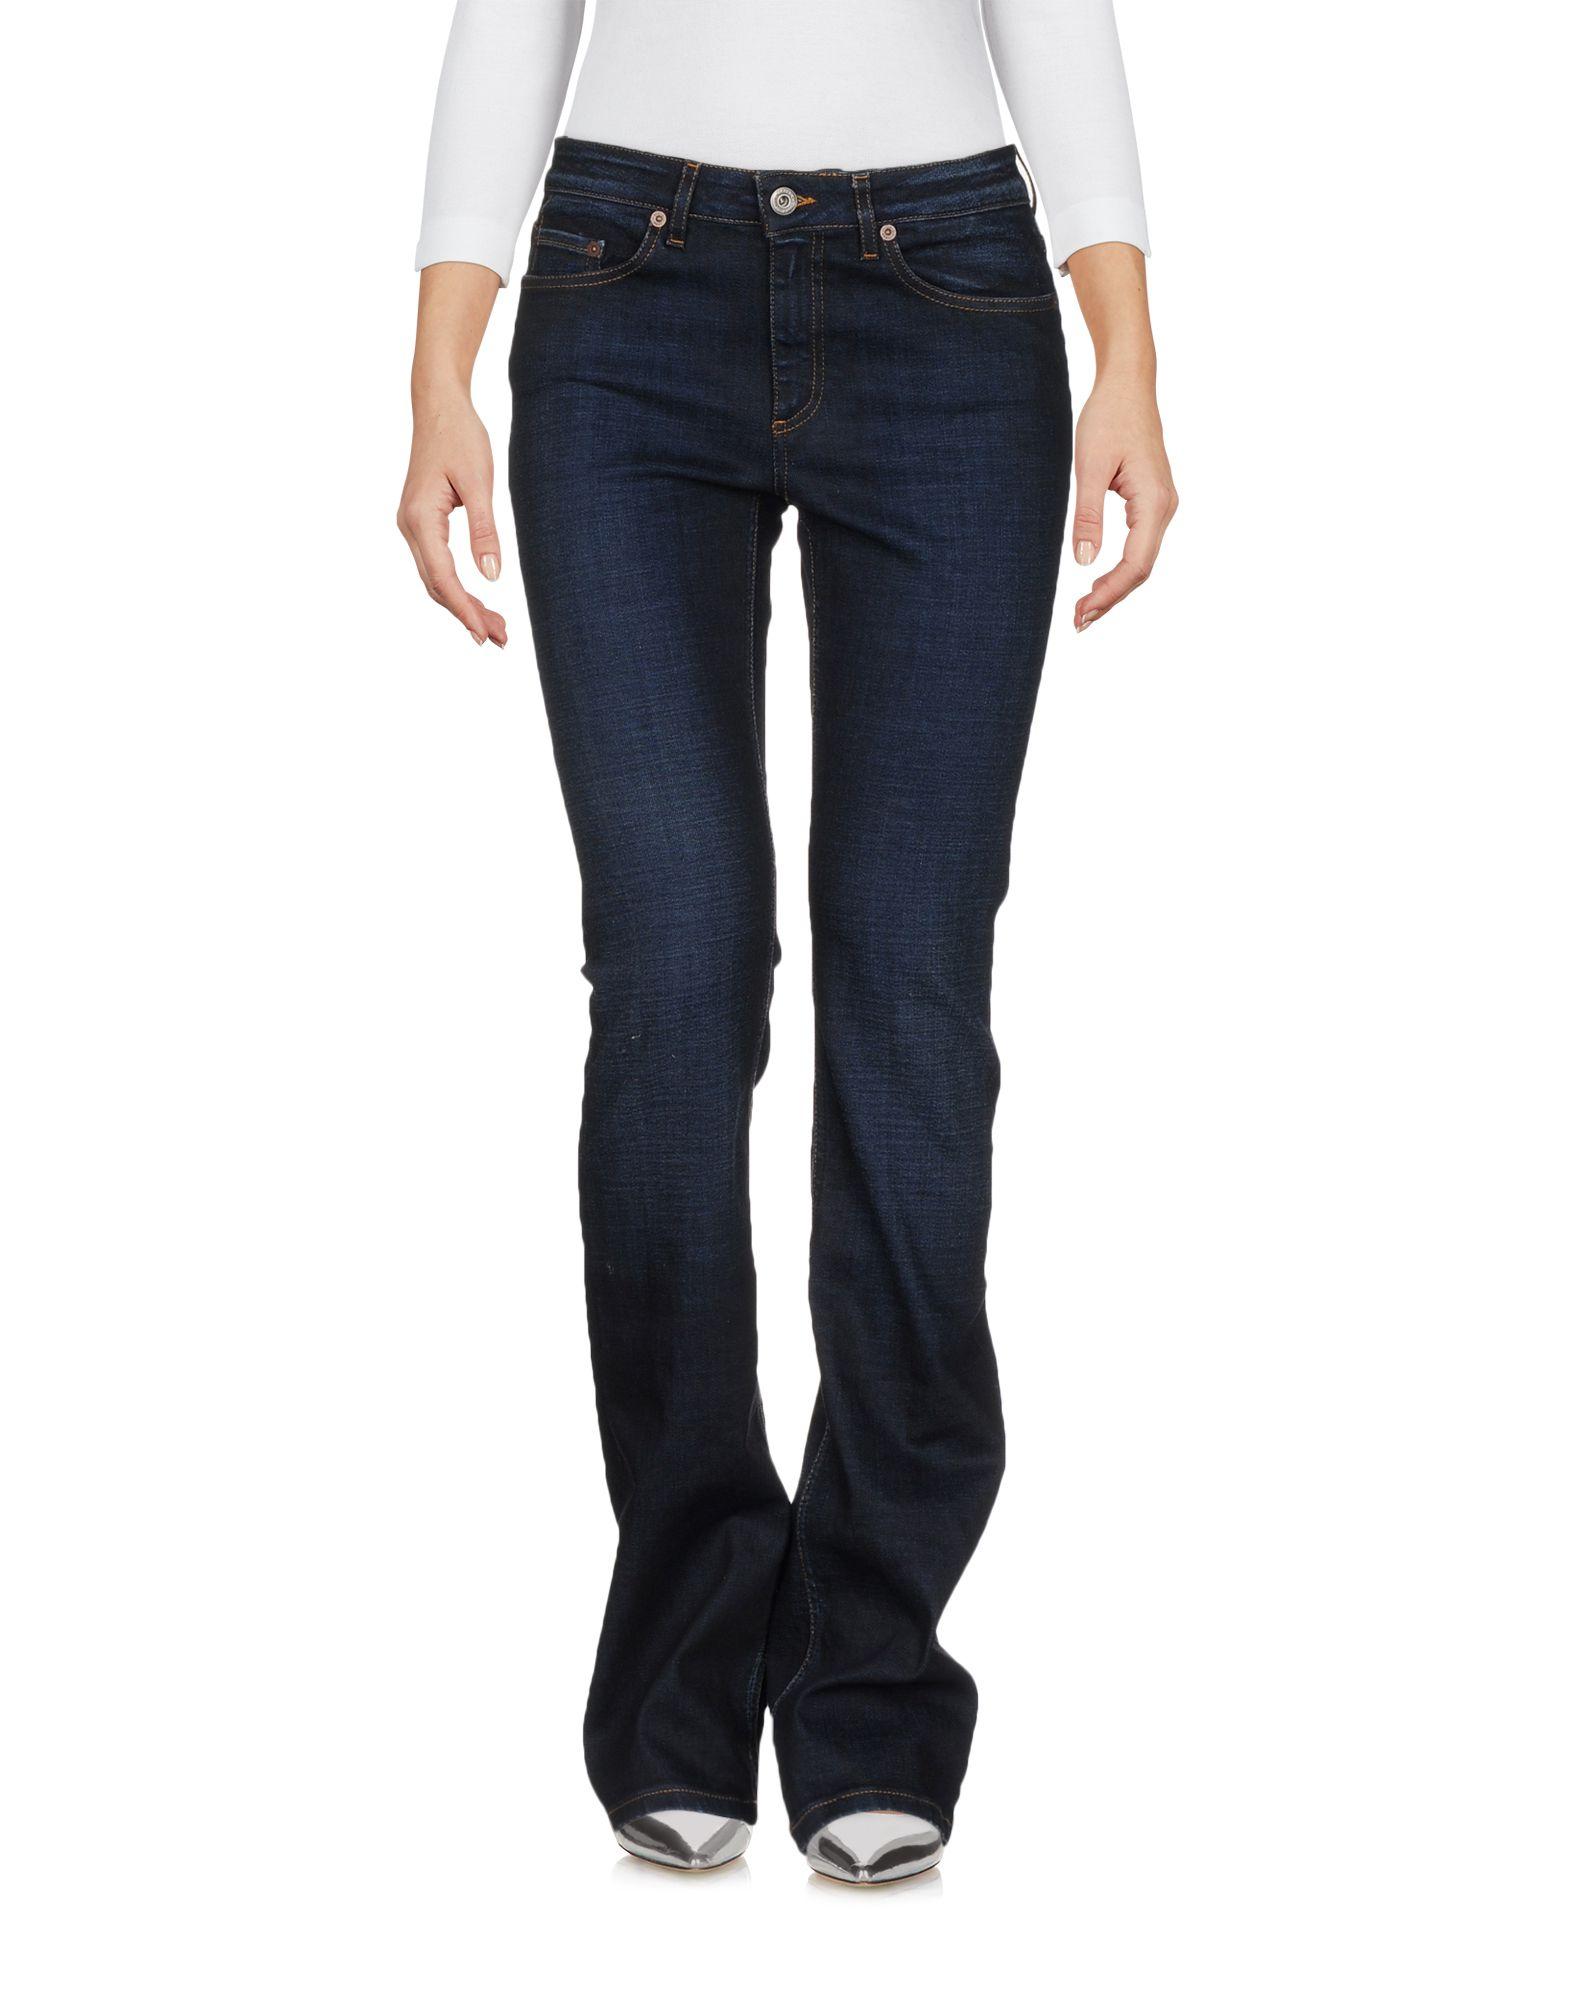 Pantaloni Jeans Woolrich Donna - Acquista online su aHUzTvPW